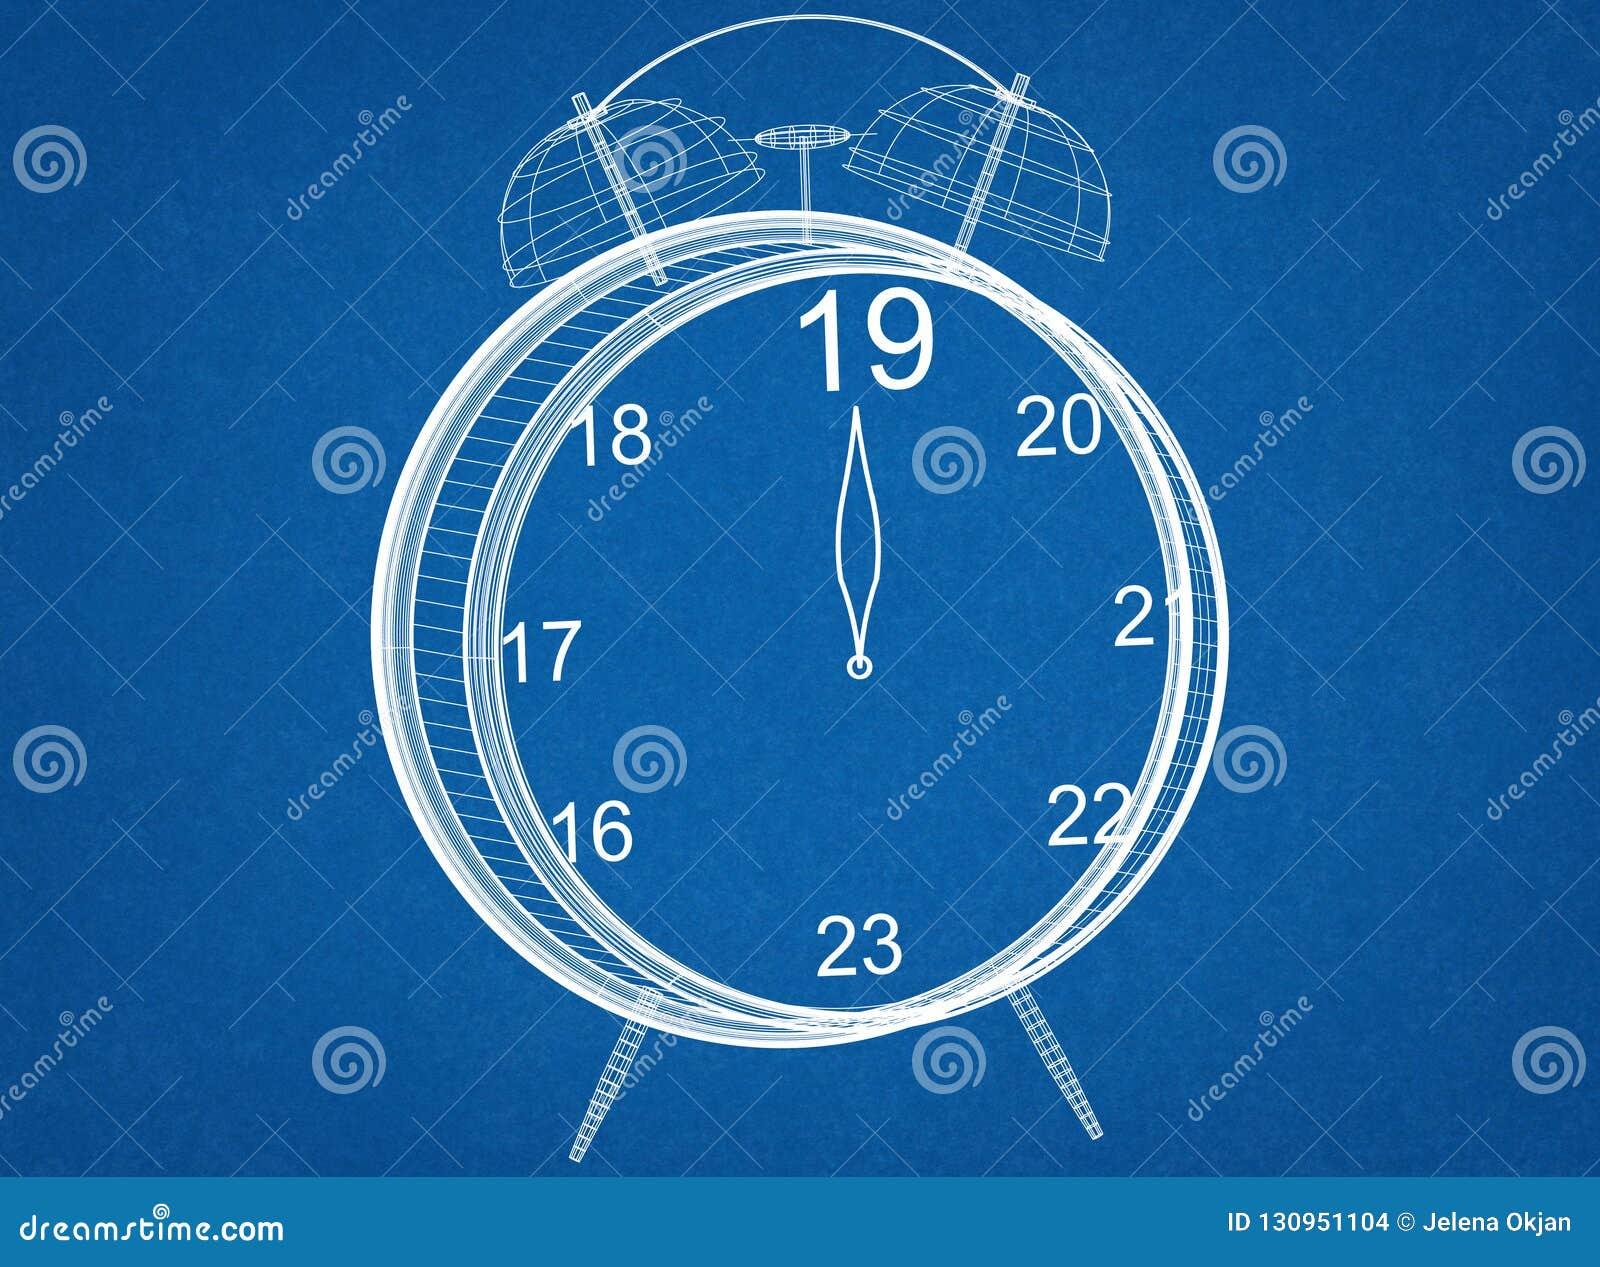 New Year countdown Clock Blueprint